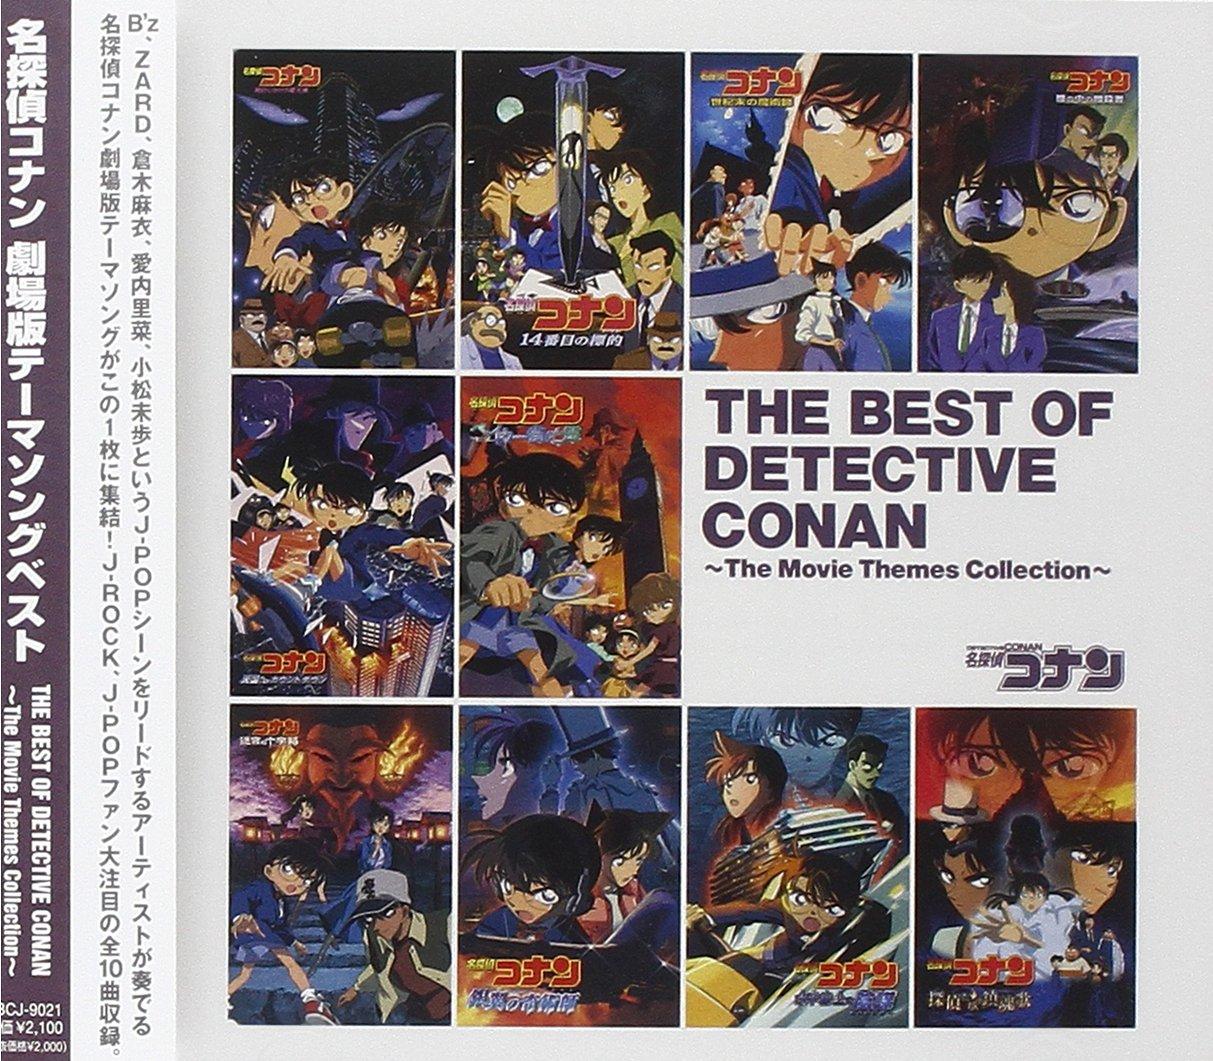 Detective conan movie theme song best amazon co uk music